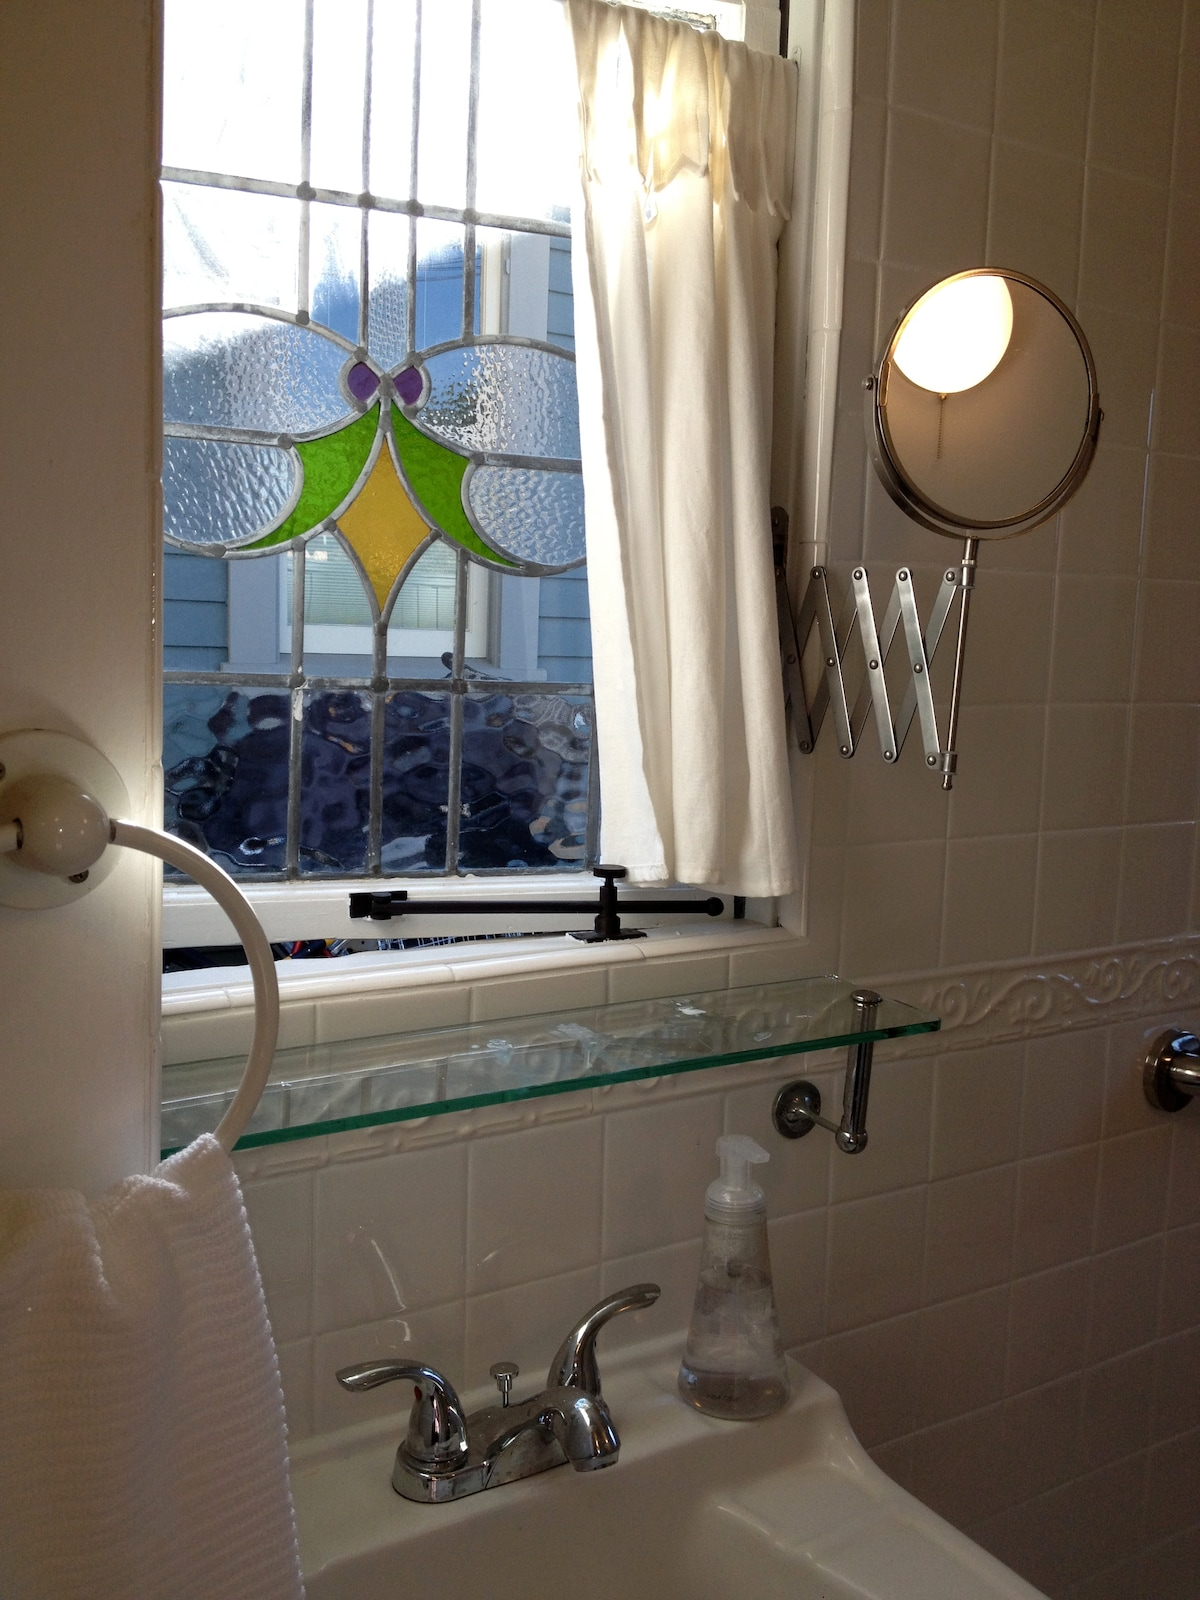 Stainglass above bathroom sink